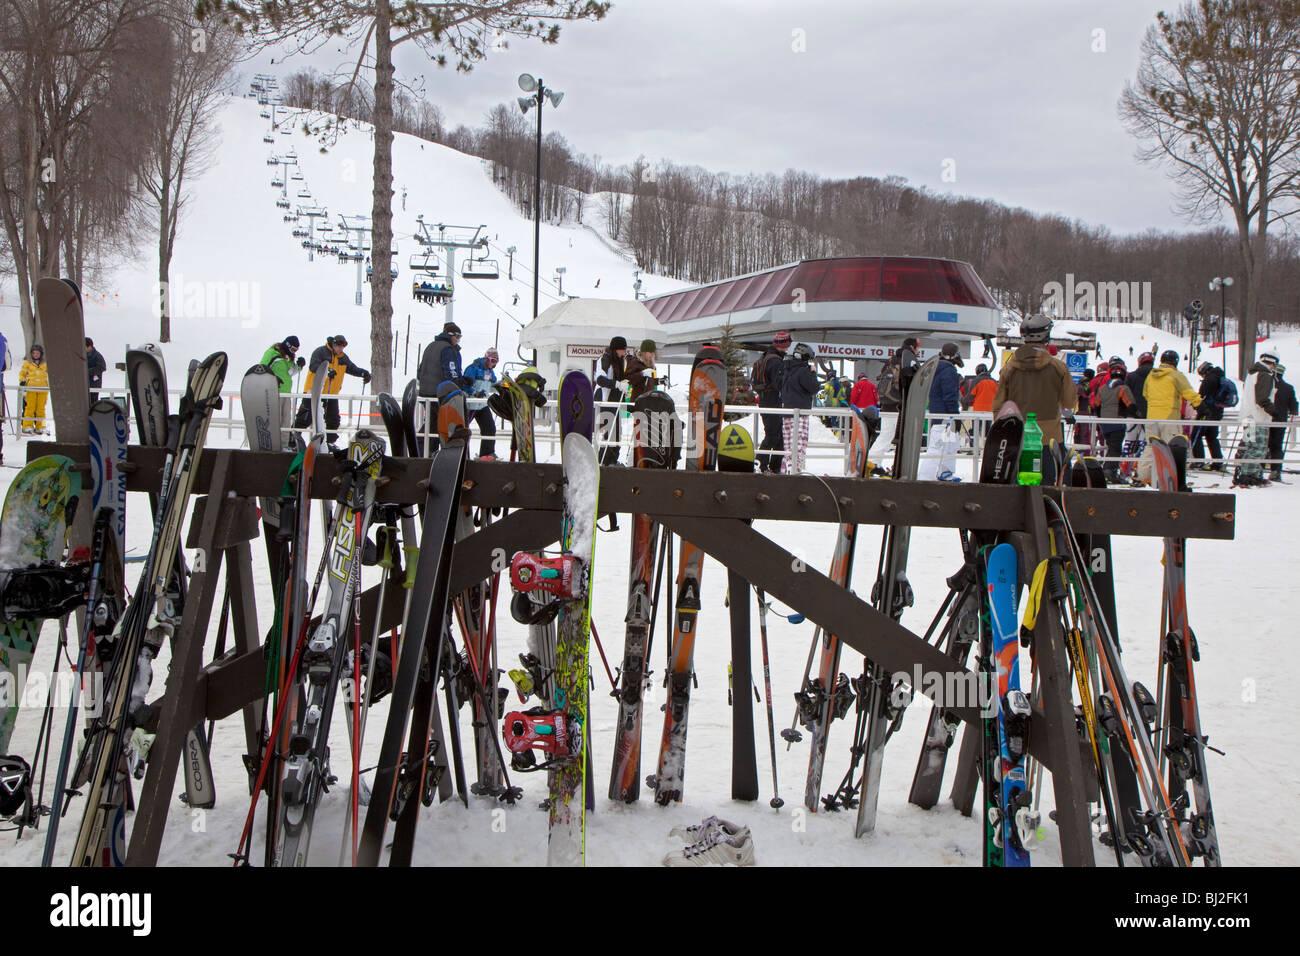 boyne falls, michigan - skis on a rack near a ski lift at boyne